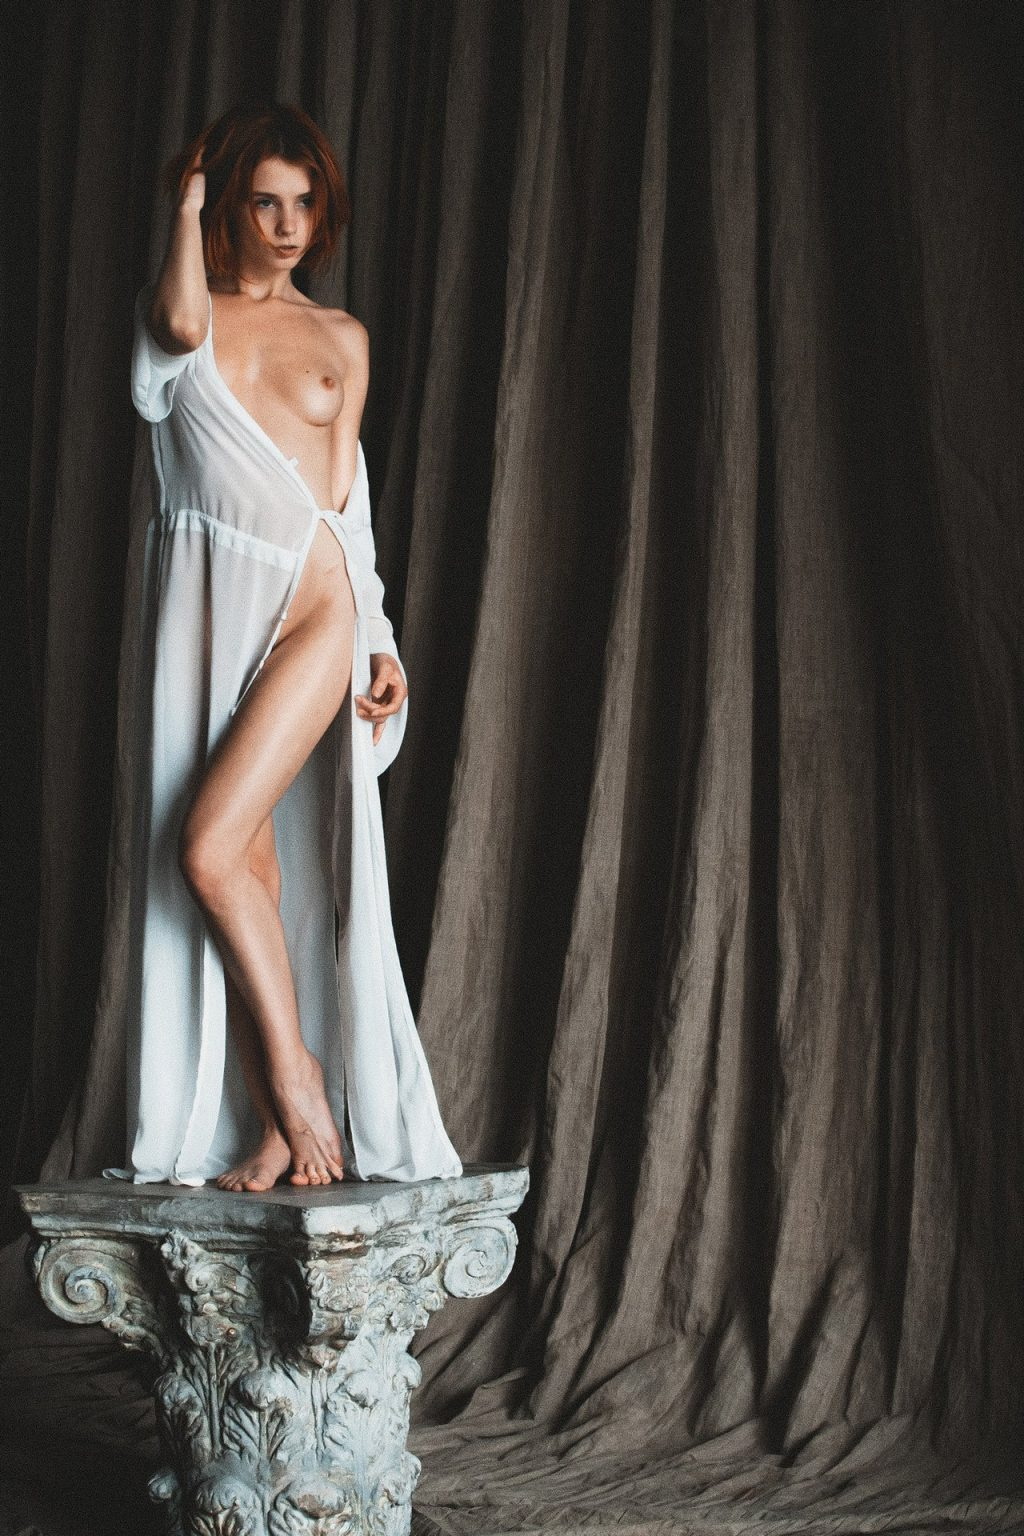 Marta Gromova Nude (7 New Photos)